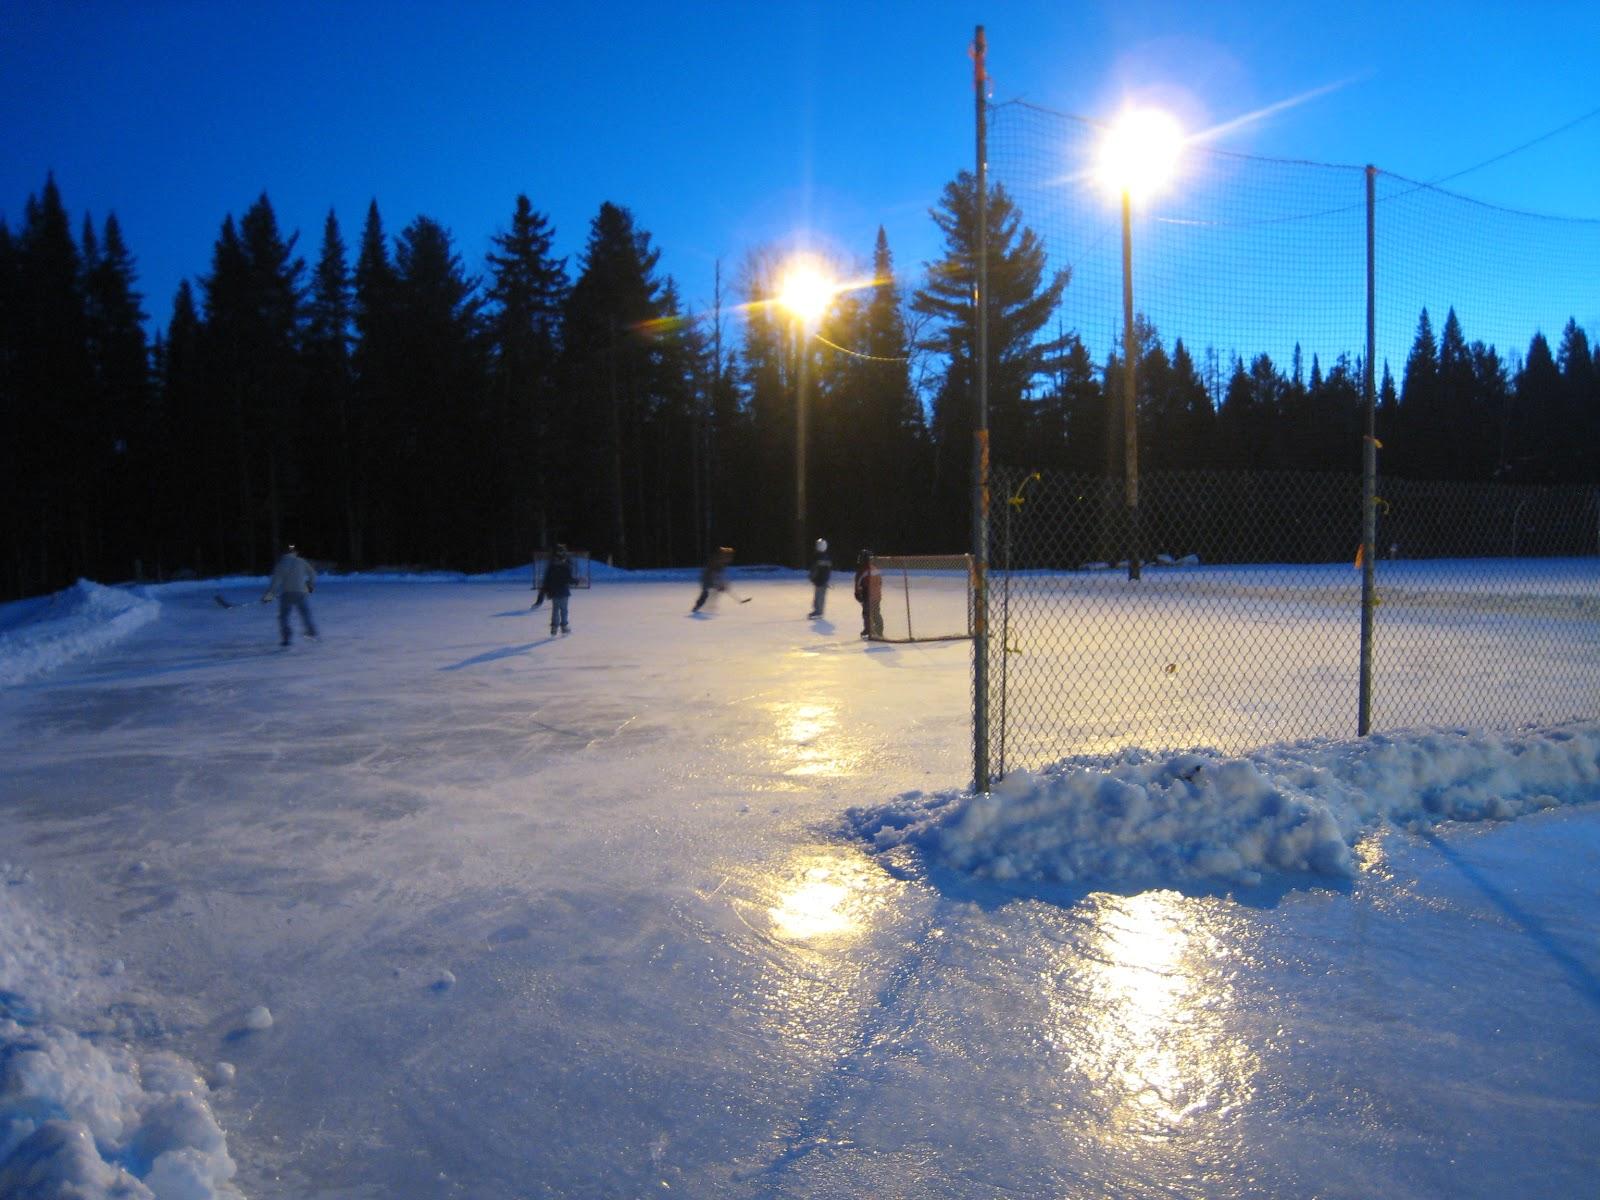 adirondack indoor ice skating rinks and beyond